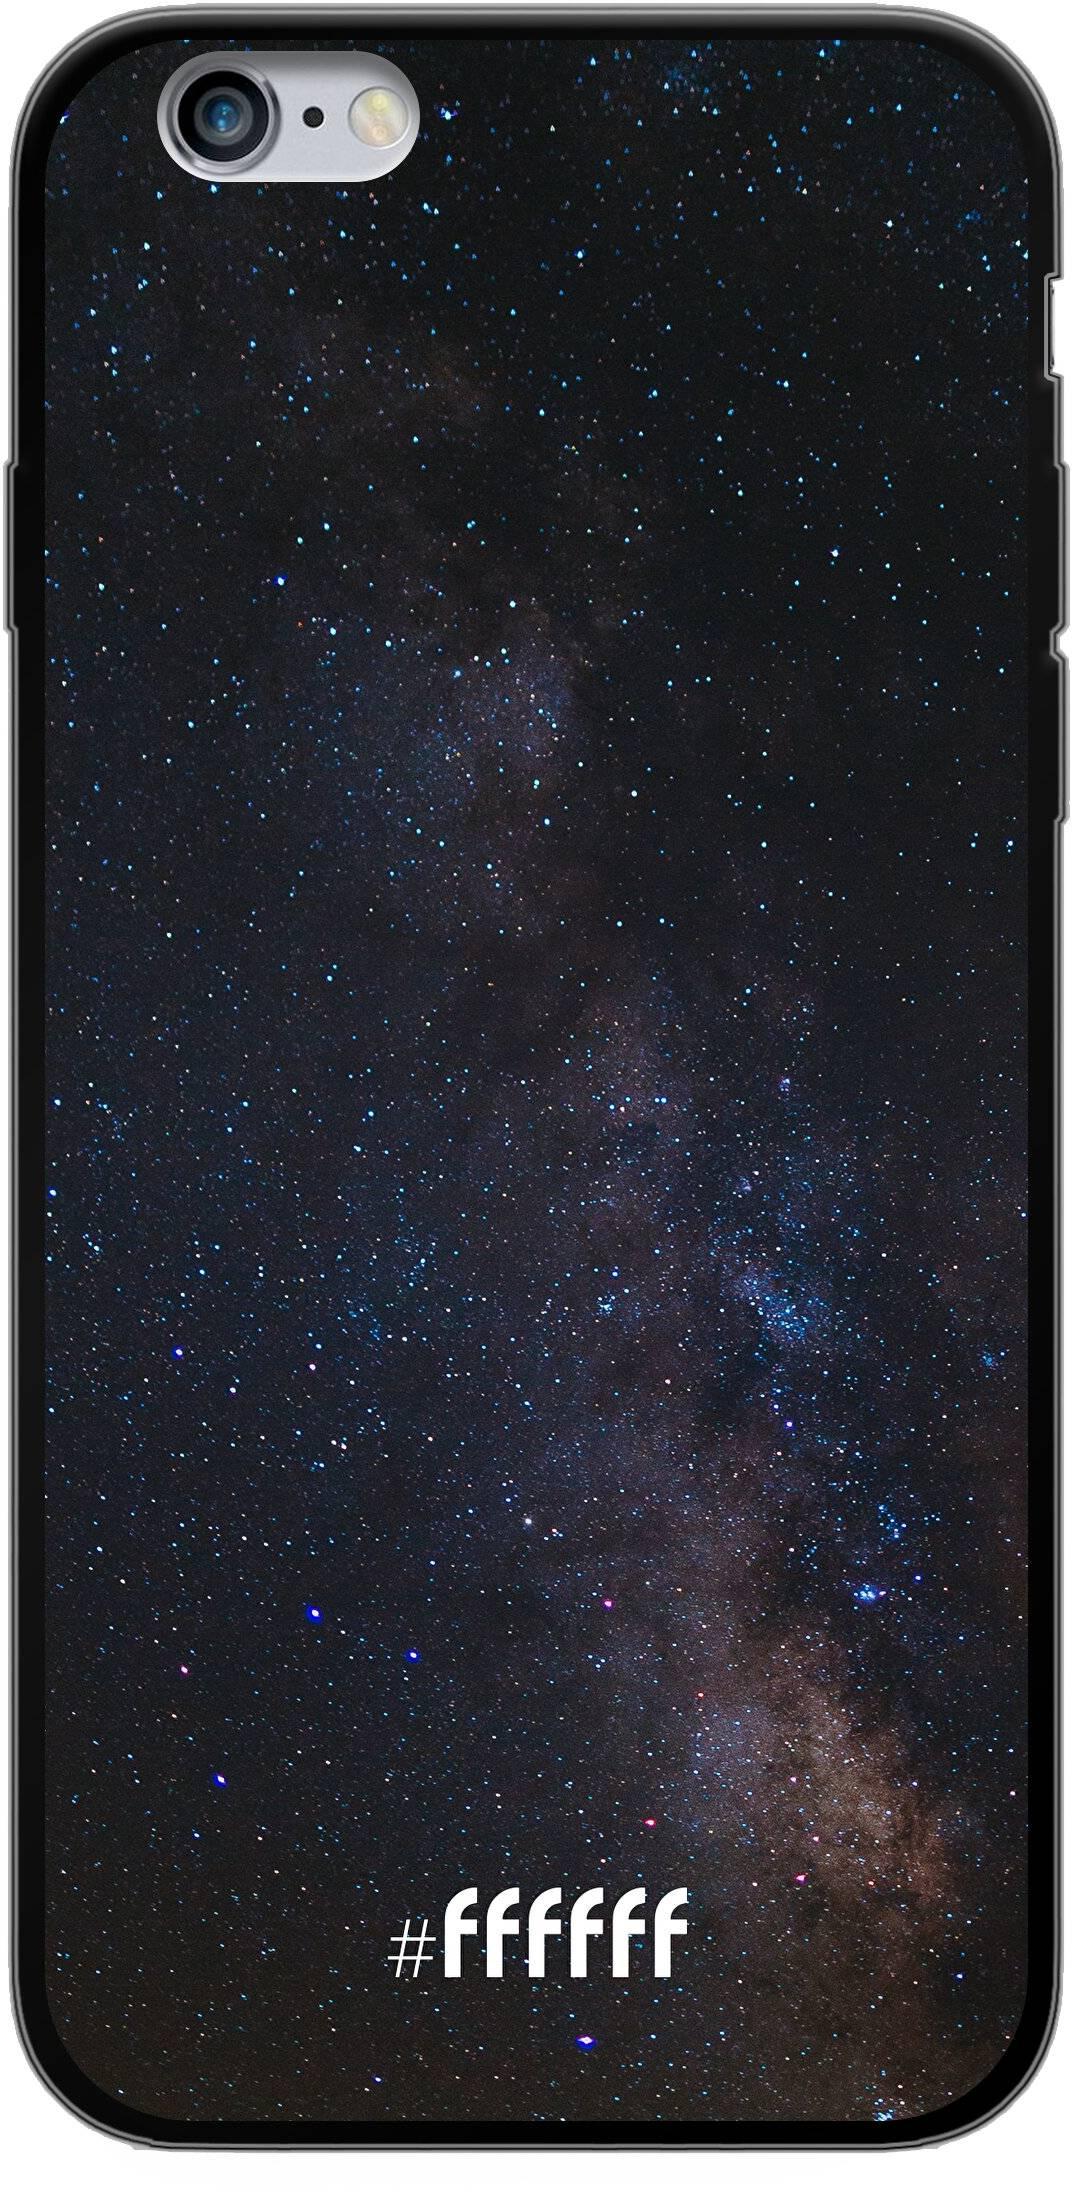 Dark Space iPhone 6